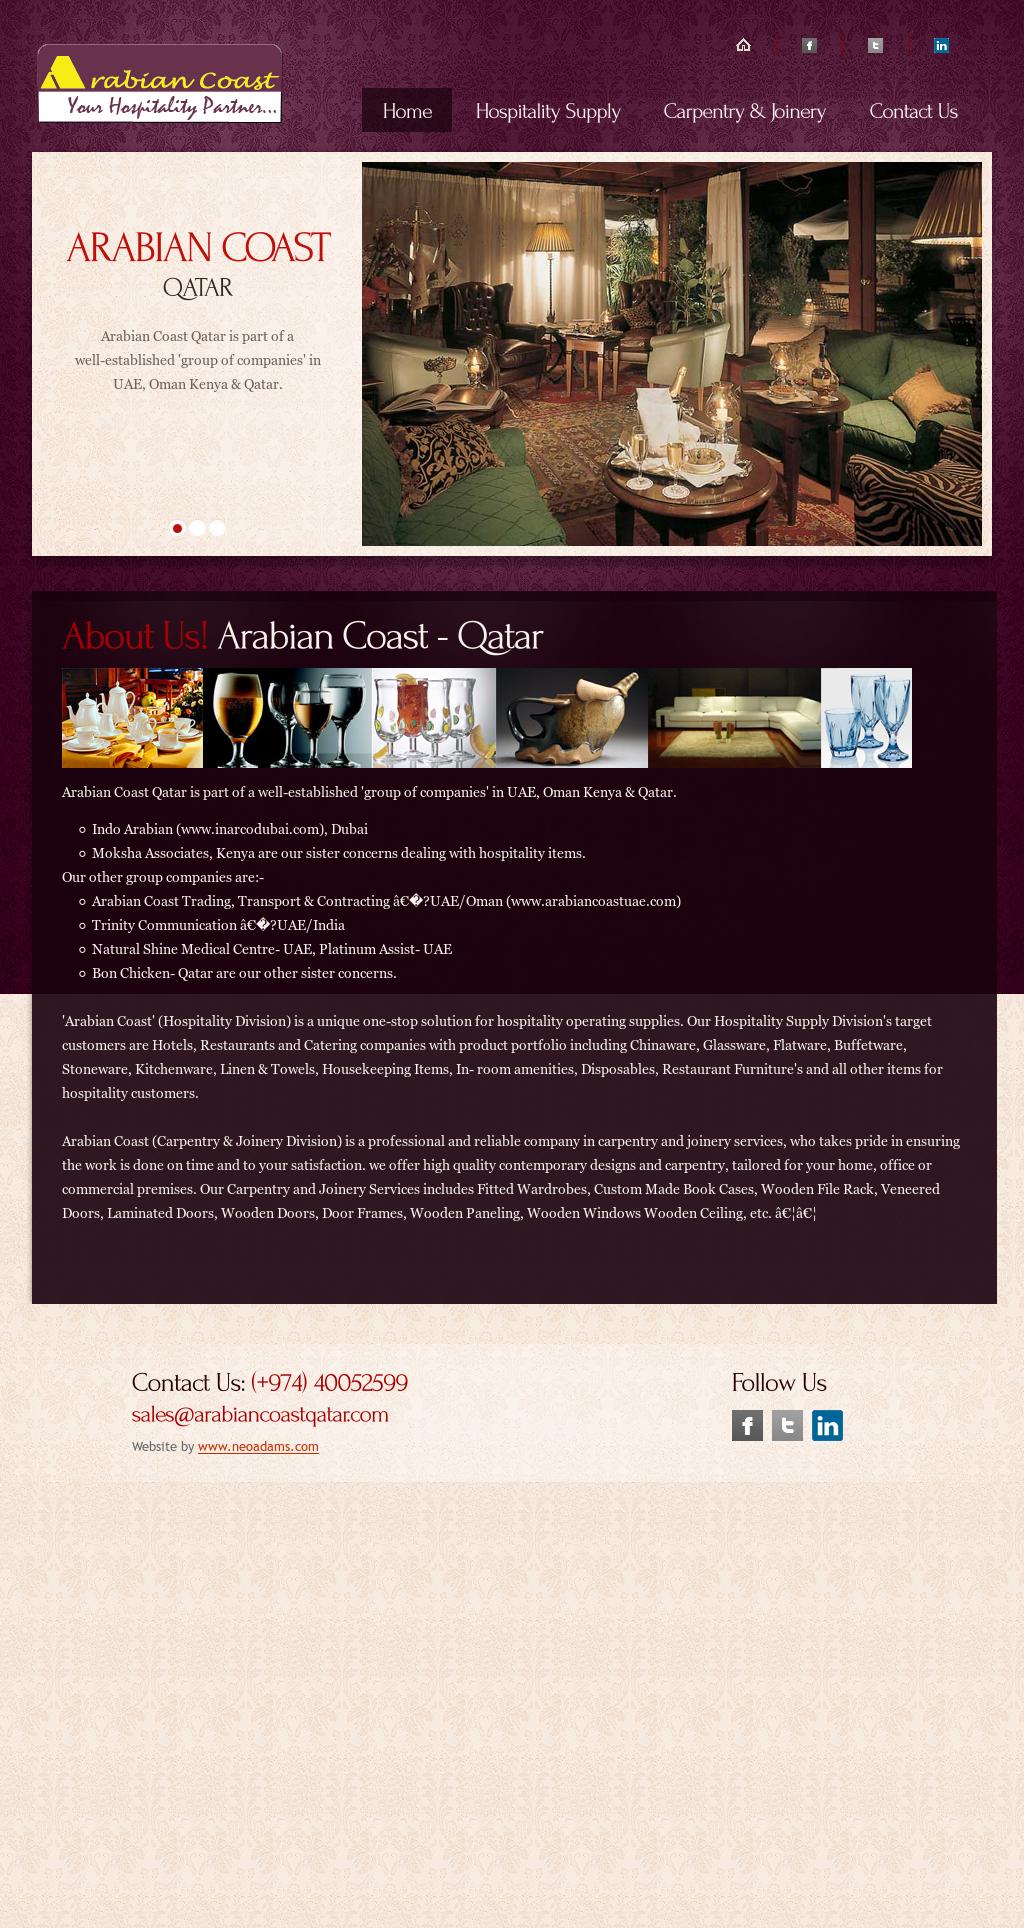 Arabian Coast Qatar - Hospitality Supply Competitors